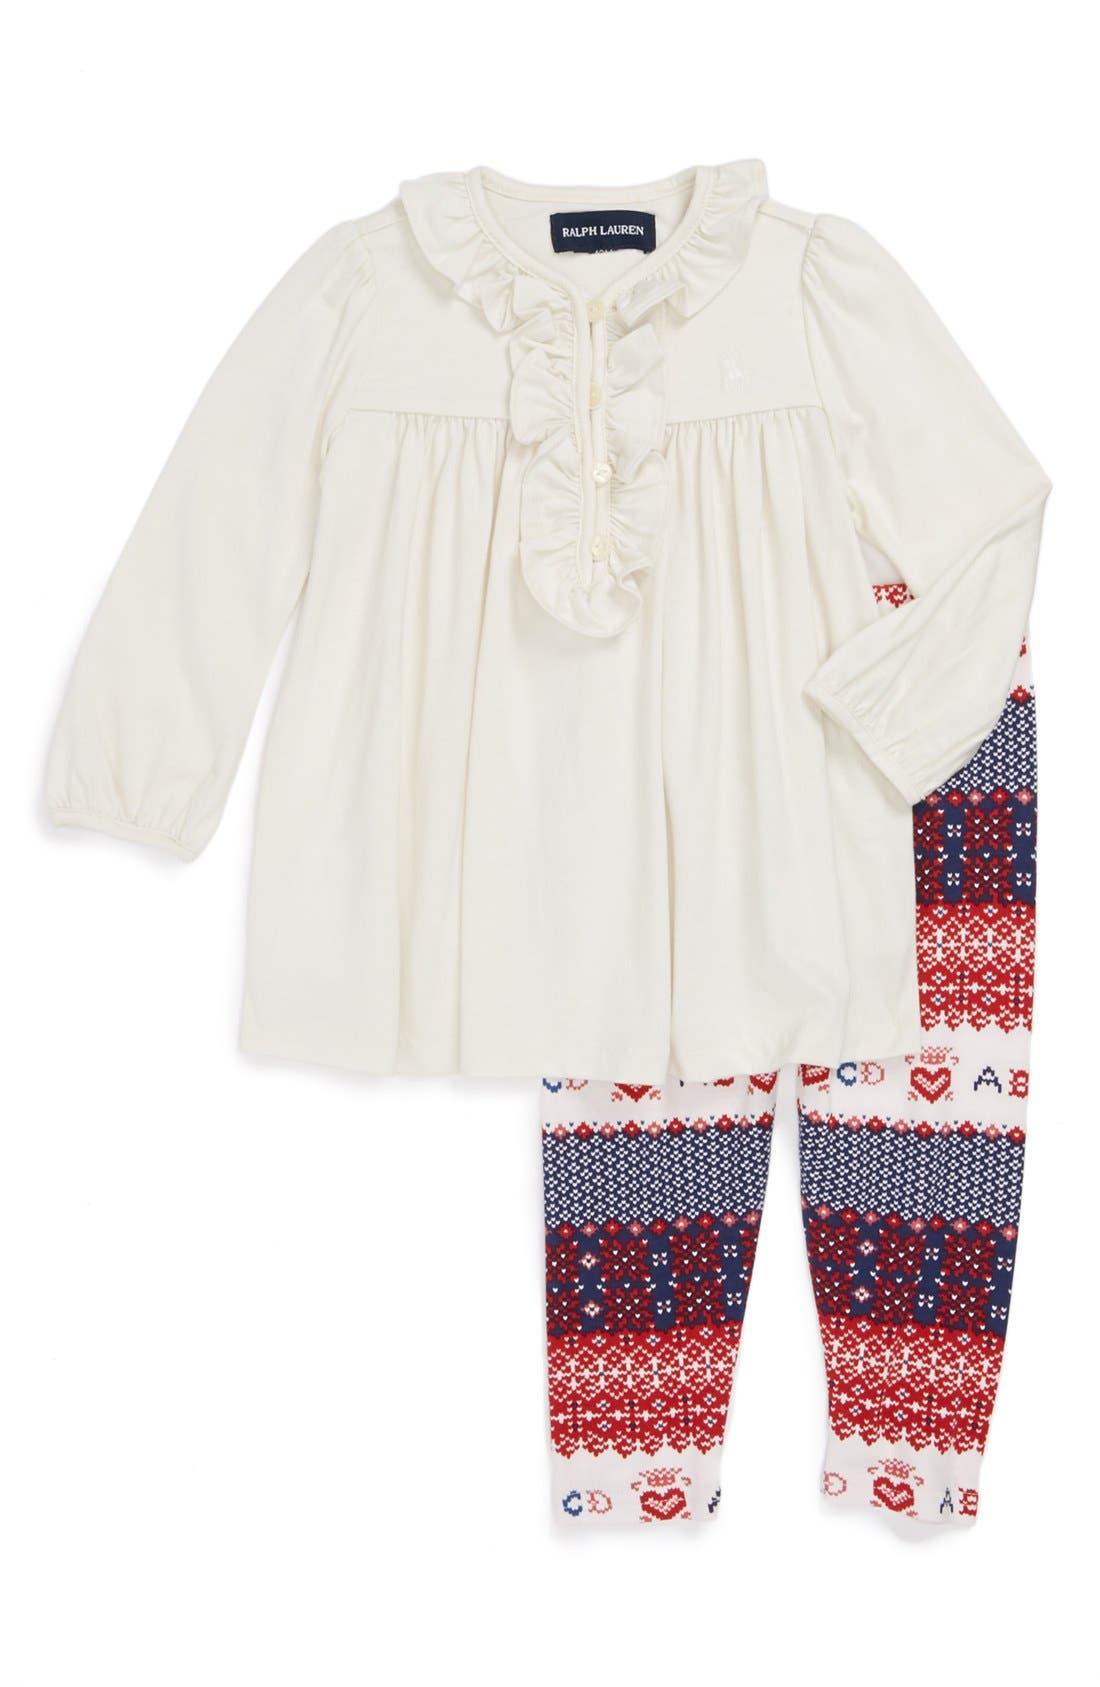 Alternate Image 1 Selected - Ralph Lauren Tunic & Print Leggings (Baby Girls)